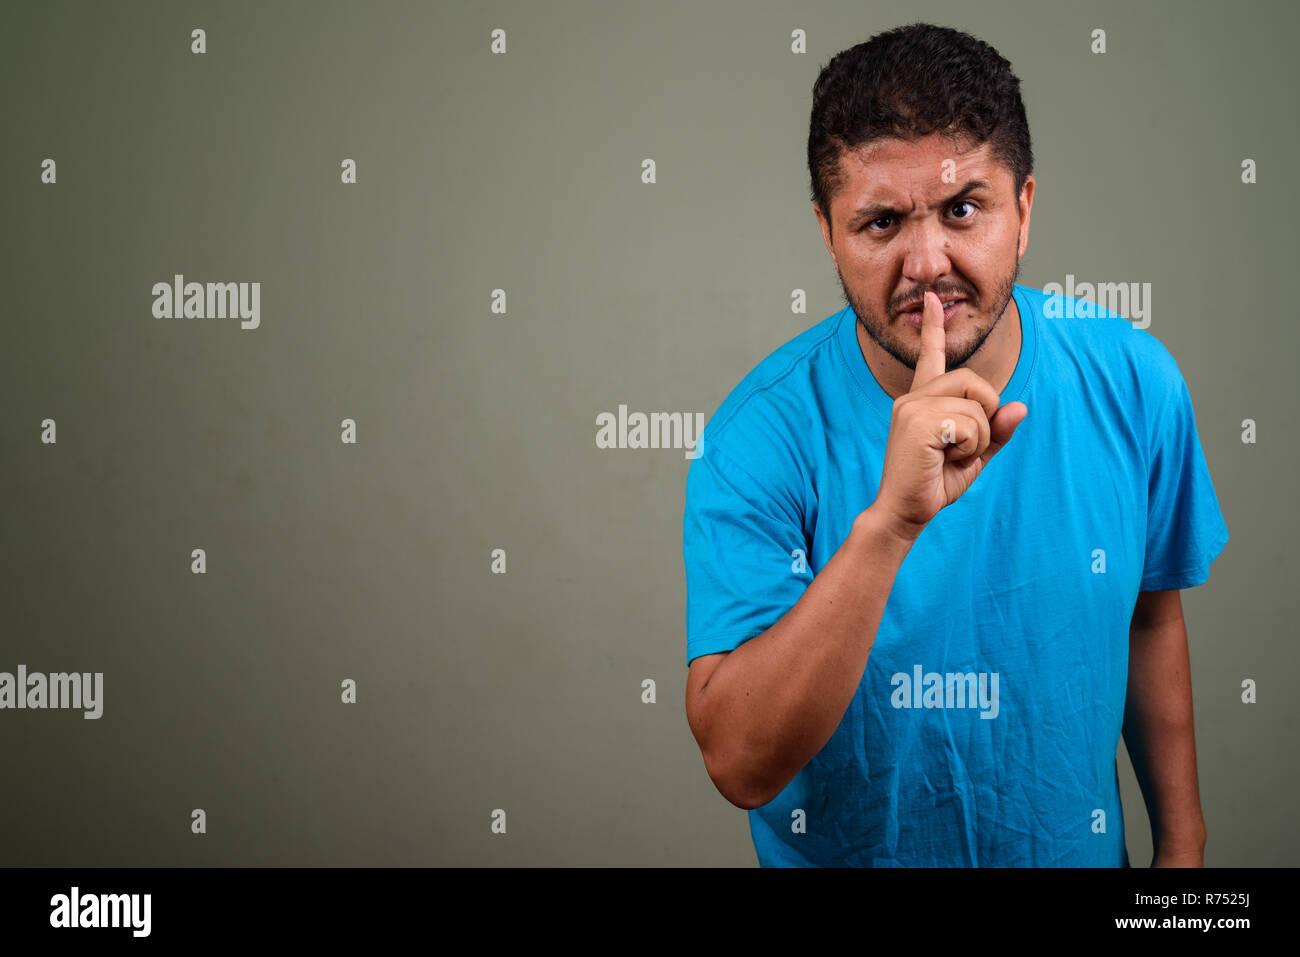 Bearded Persian man wearing blue shirt against colored backgroun Stock Photo